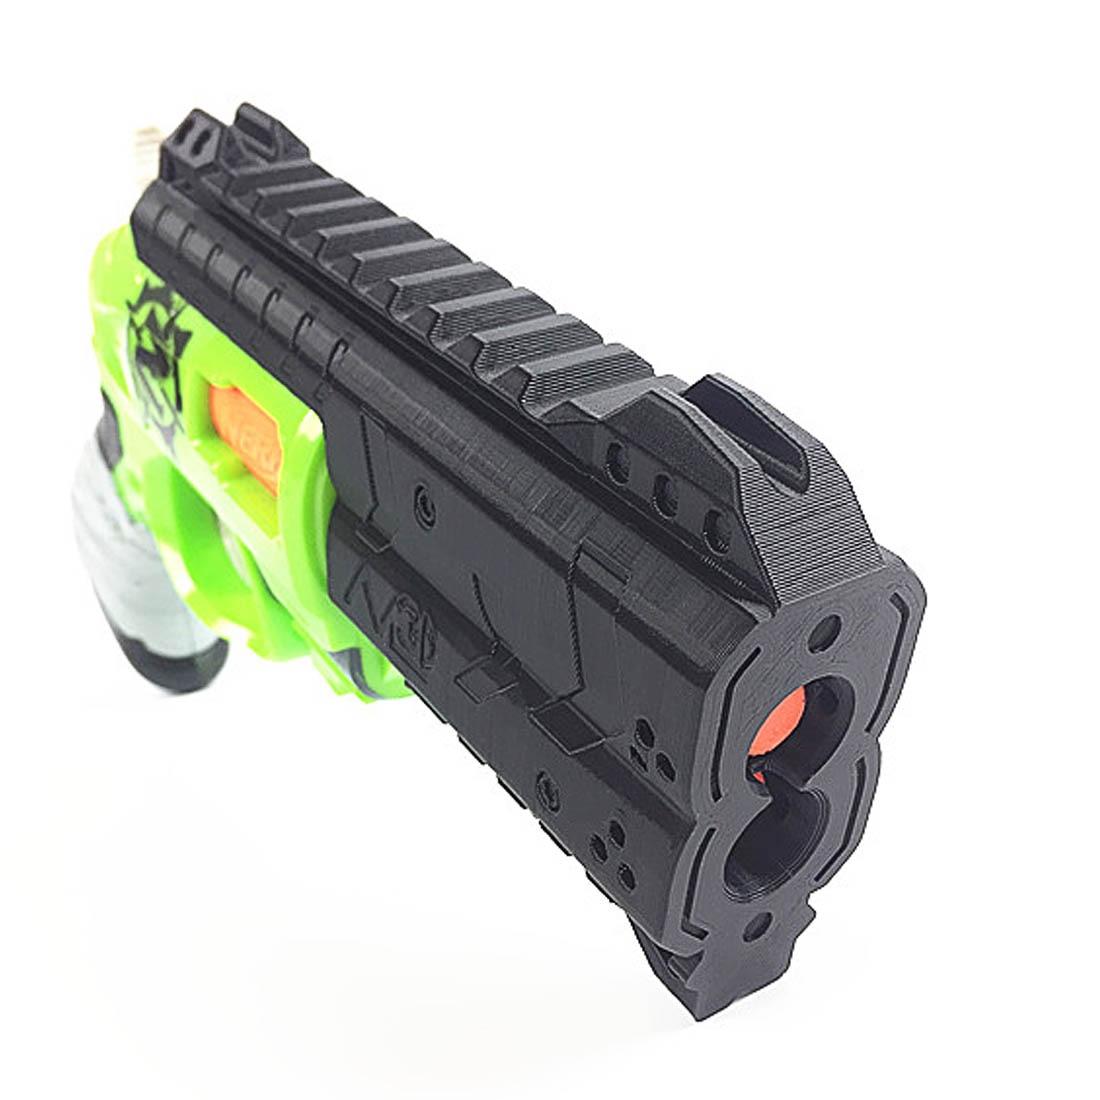 купить Surwish 3D Printing Front Tube A-3.0 Decoration Part for Nerf Zombie Strike Doublestrike Blaster-Black/ Orange/ Grey по цене 1259.99 рублей